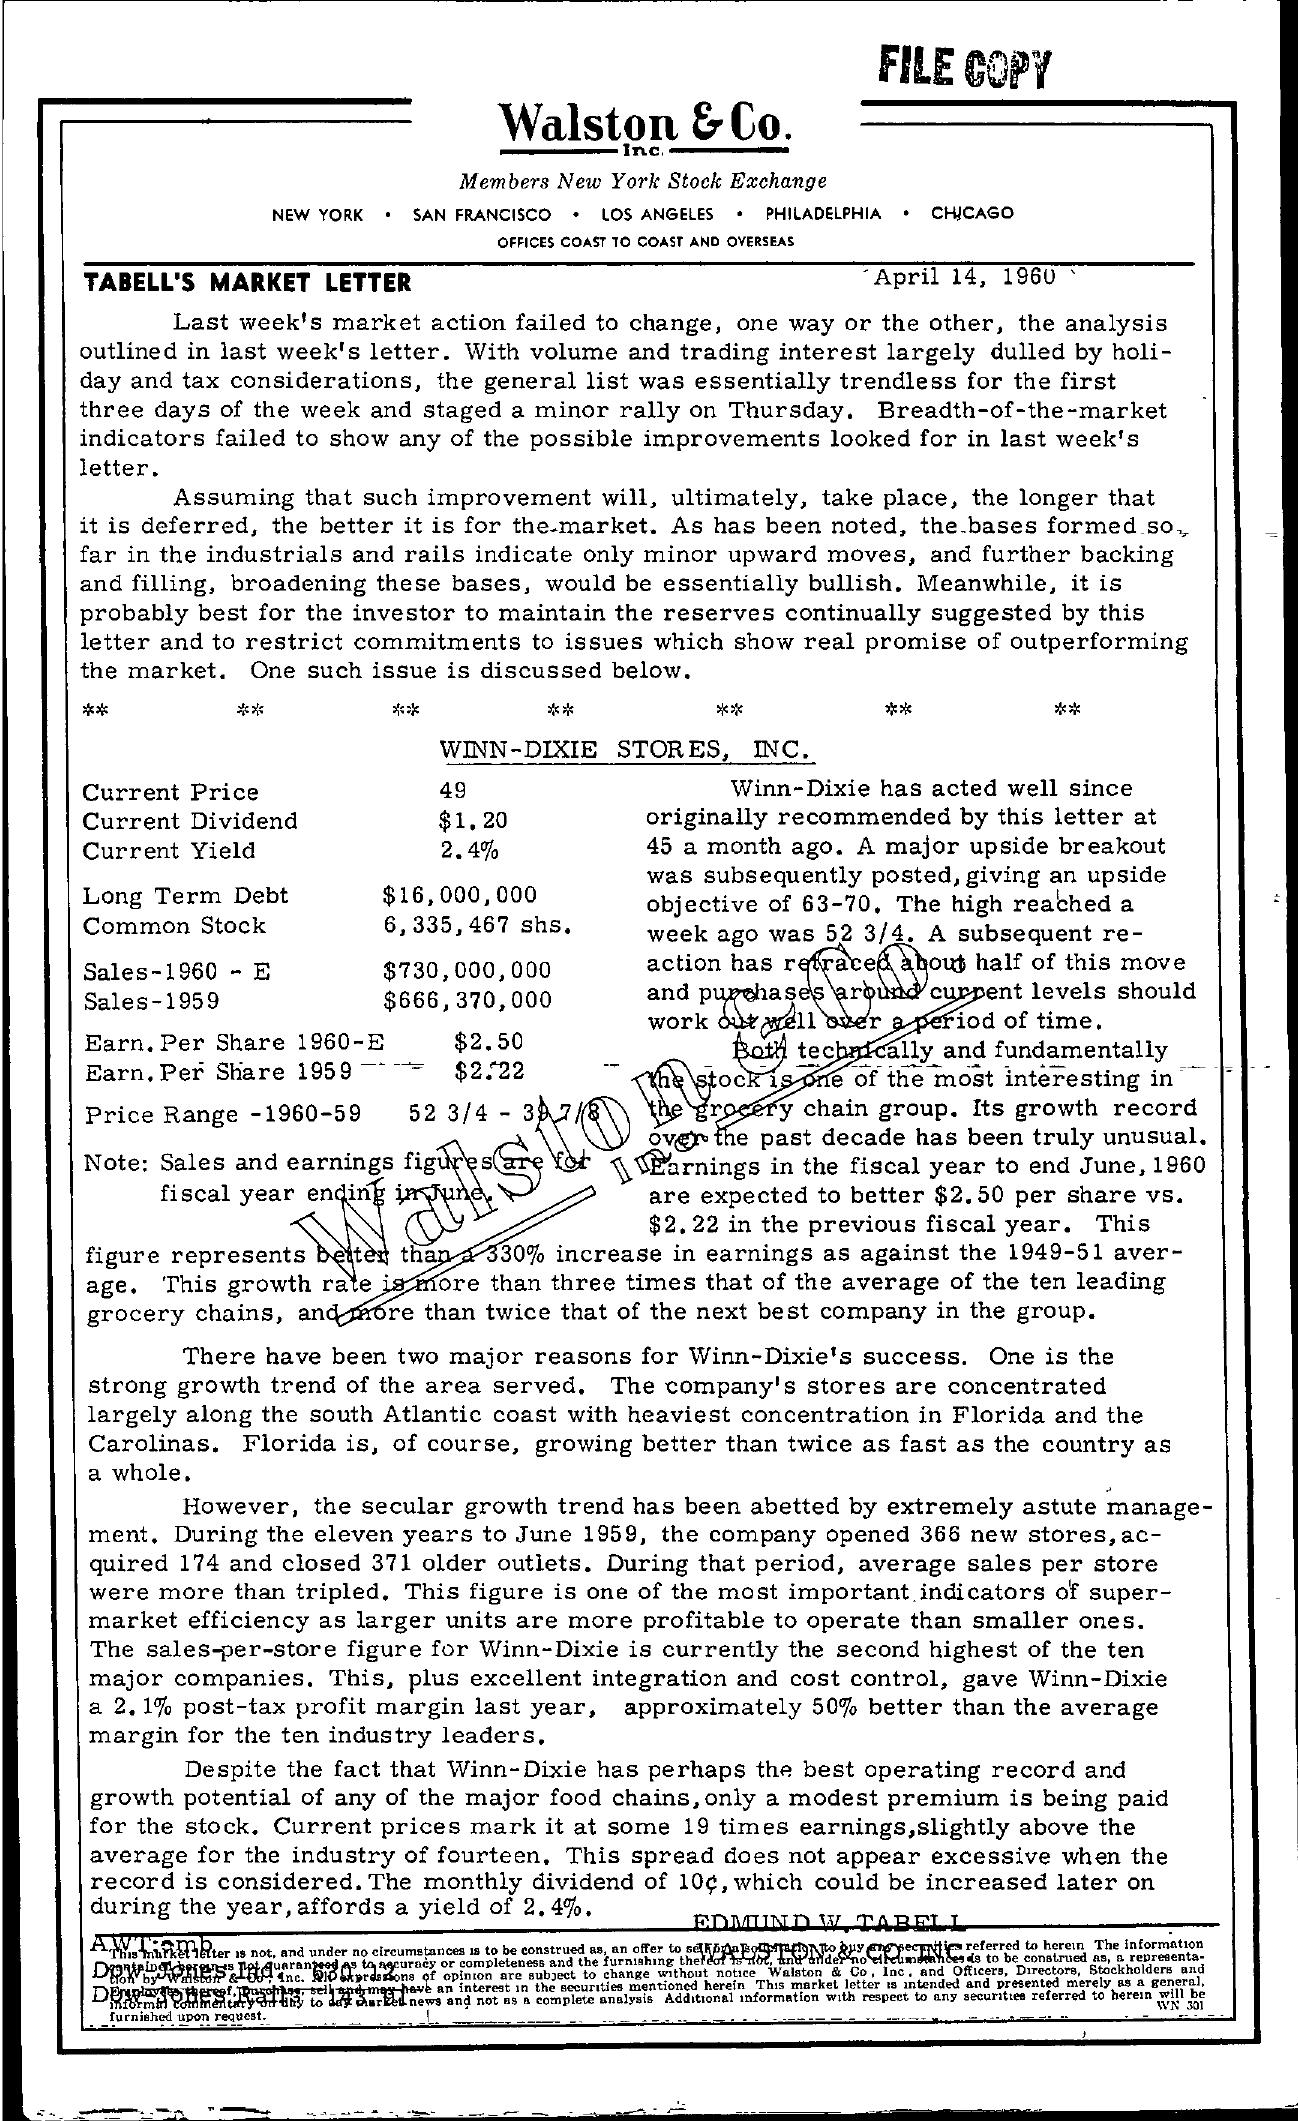 Tabell's Market Letter - April 14, 1960